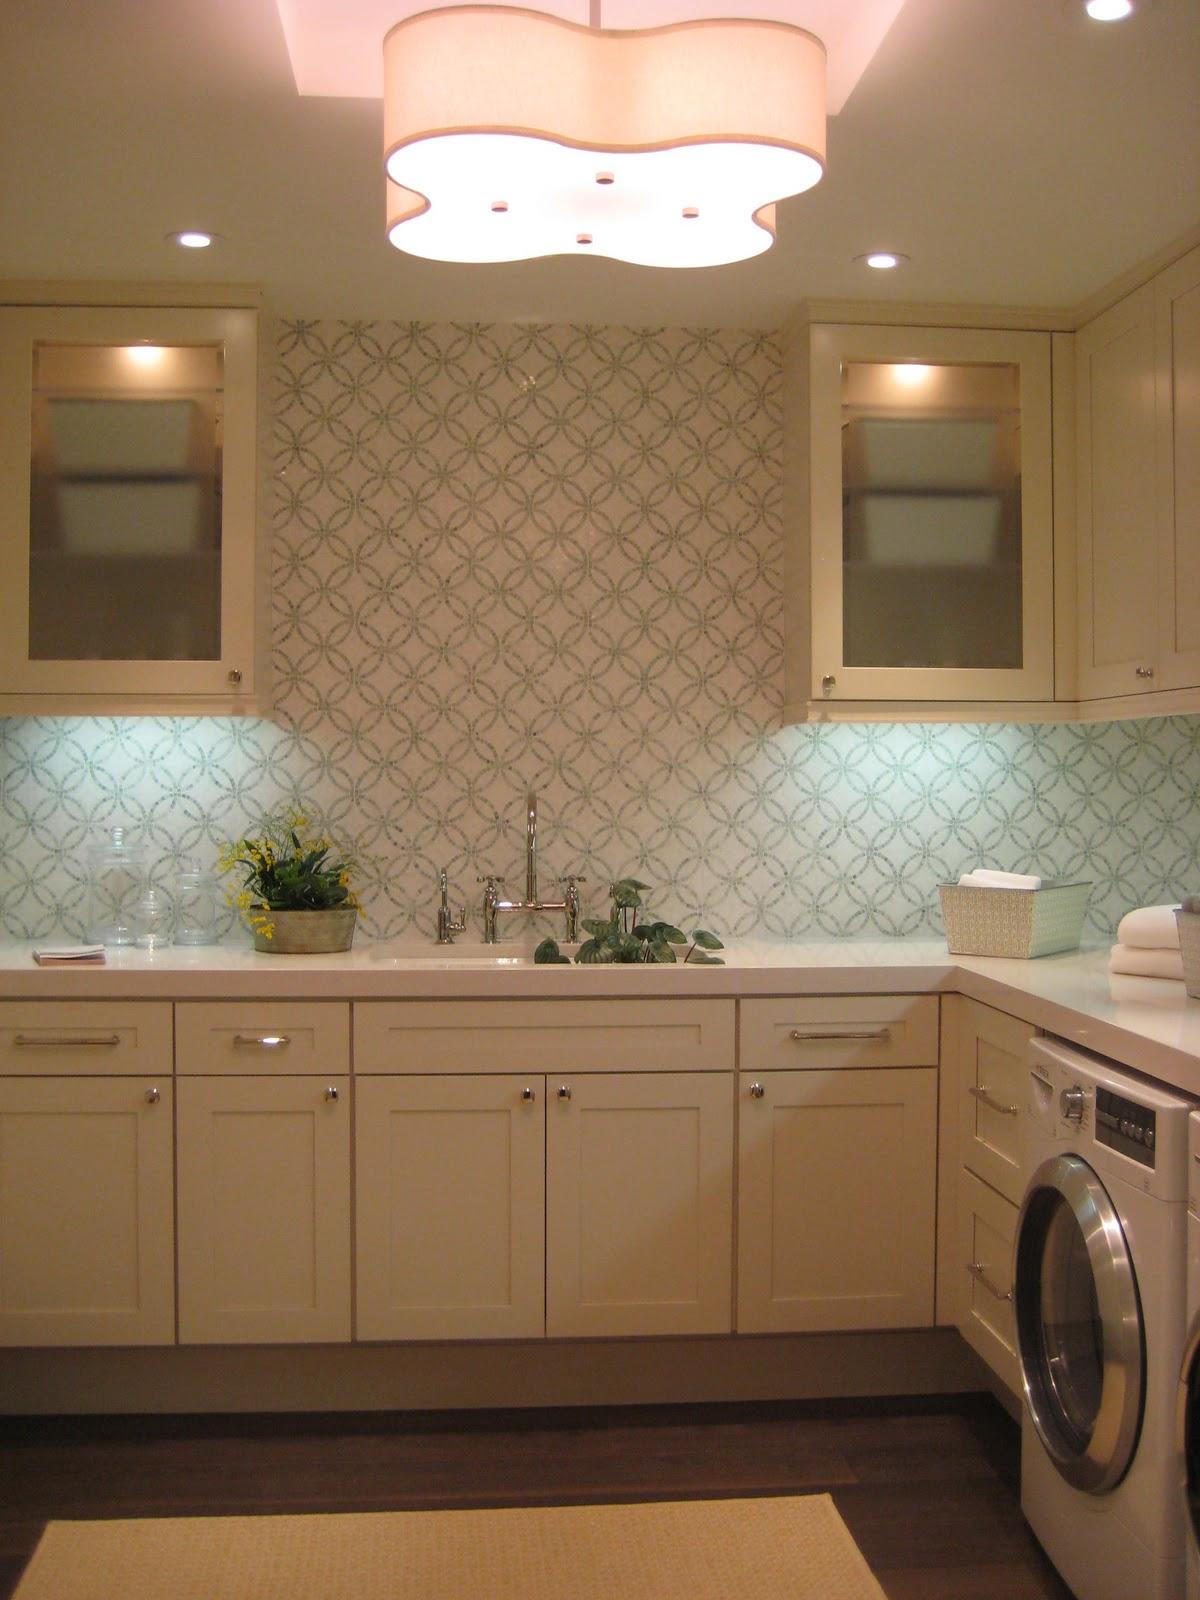 online home decorating courses trend home design and decor advanced sketchup course interior design portland or